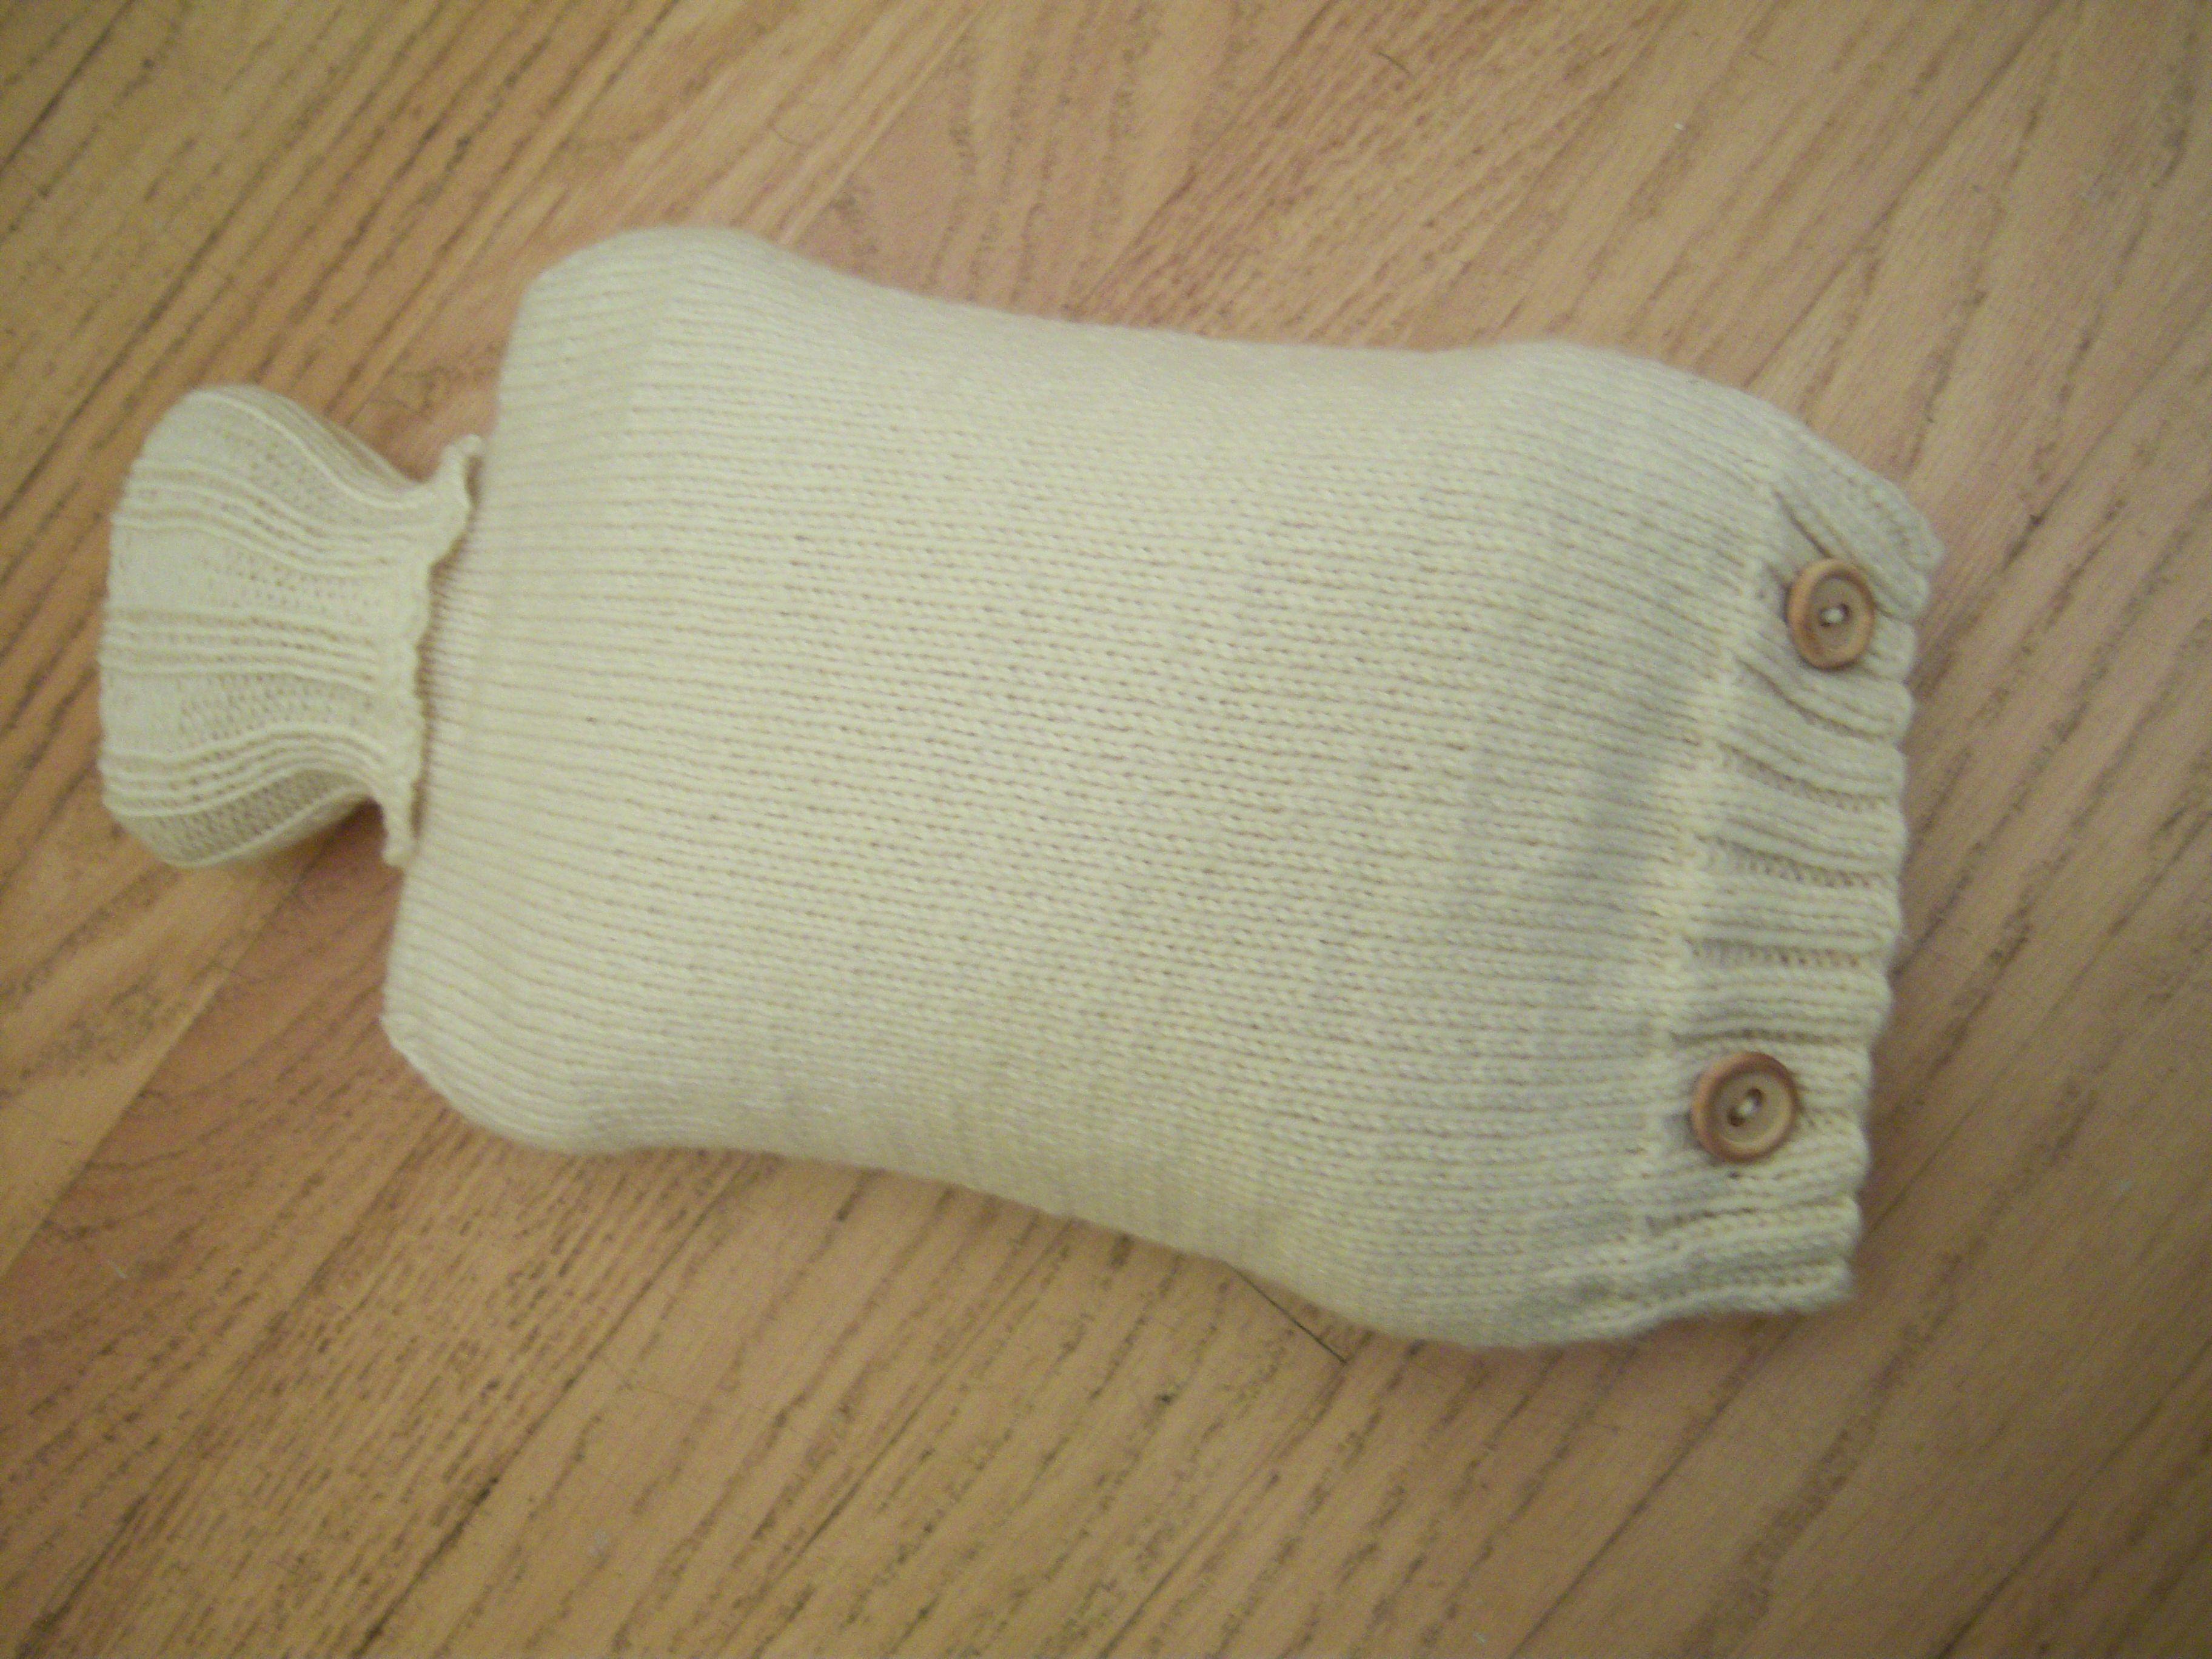 Hot Water Bottle Cover Pattern - KnitPicks Staff Knitting Blog ...